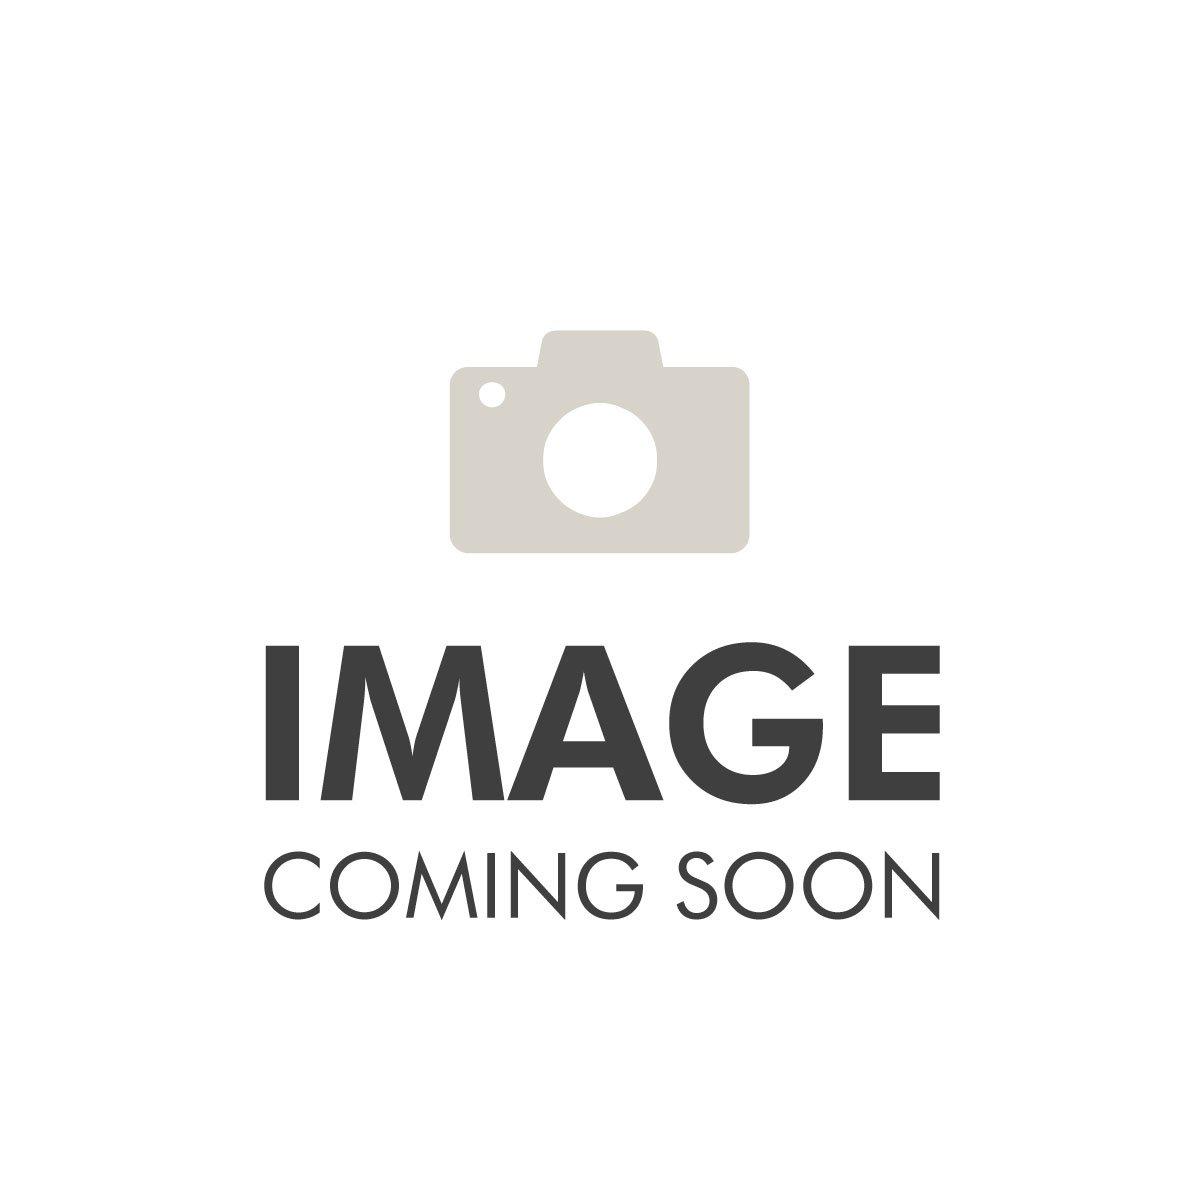 AMD - Foil Point Springs (10-Pack)